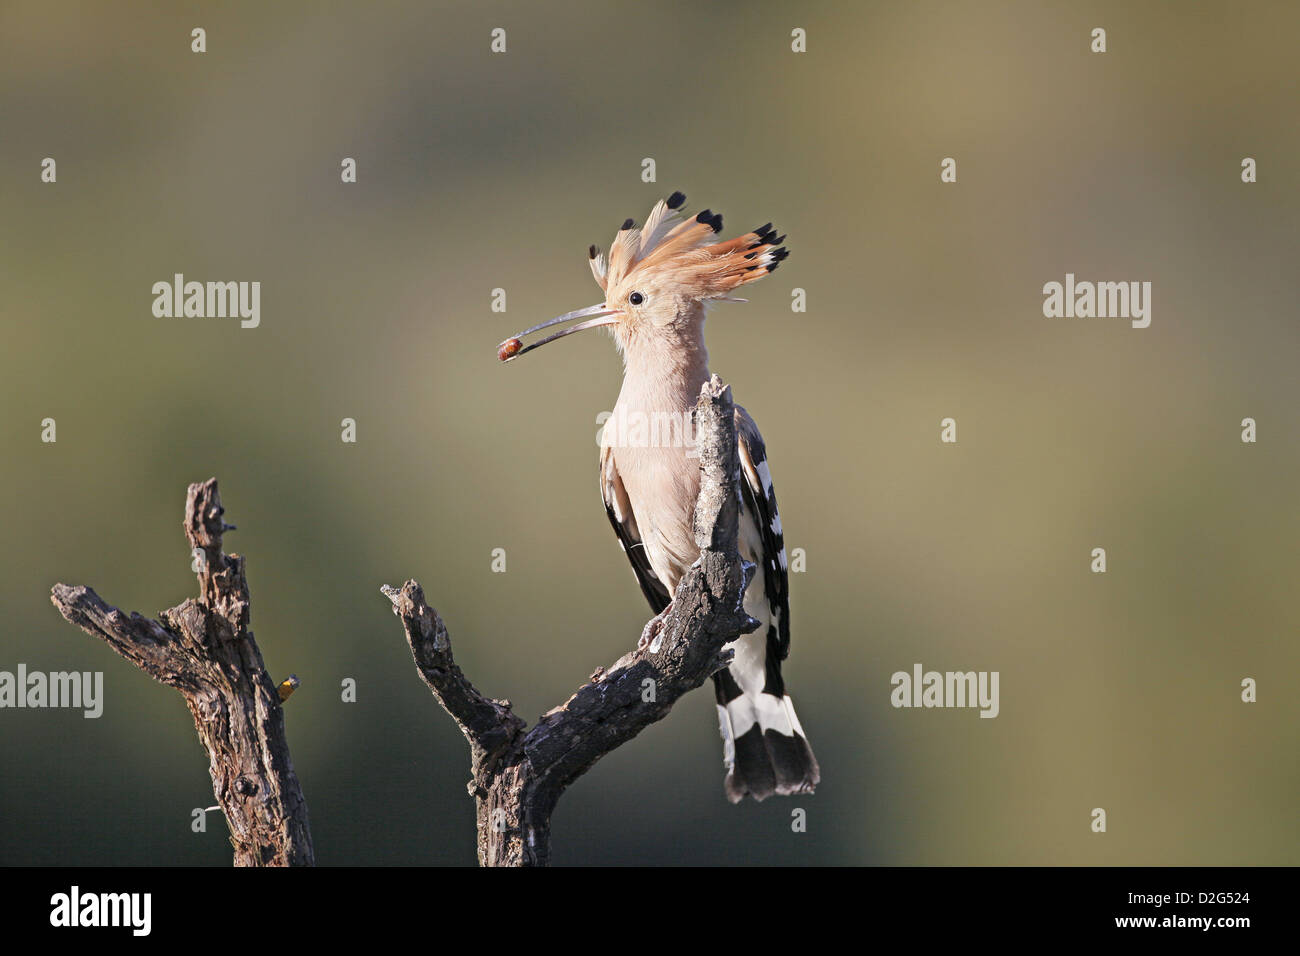 Hoopoe, Upupa epops with pupa prey for nestling - Stock Image